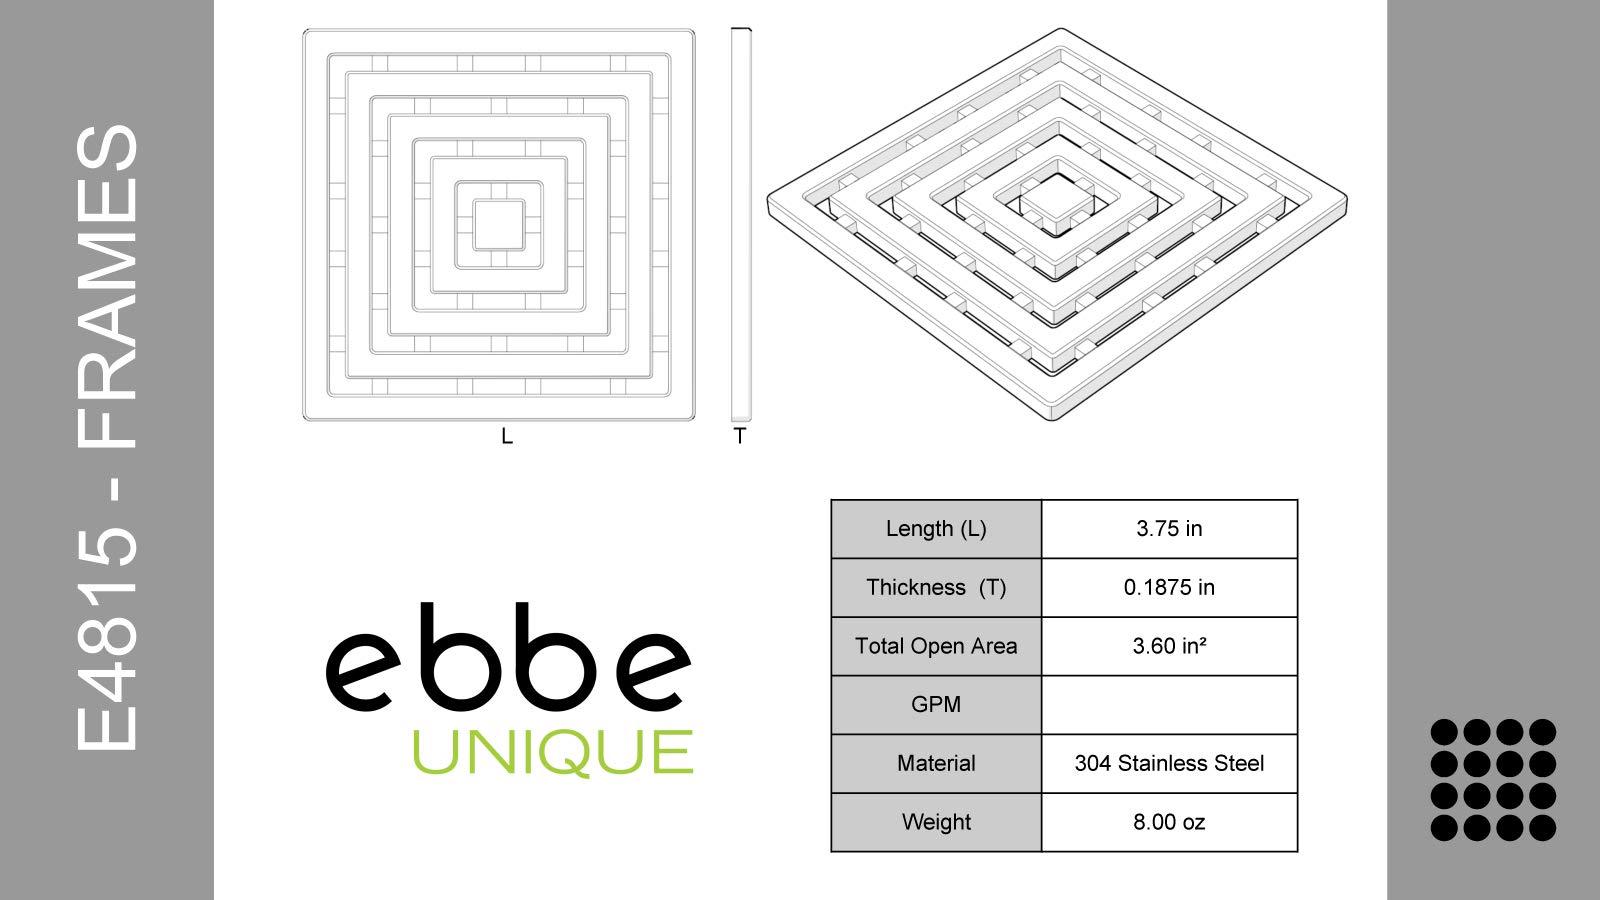 Ebbe E4815-PC-E4400 Unique Grate in Polished Chrome & Drain Riser w/T-Puller & Hair Trap by ebbe-America (Image #2)